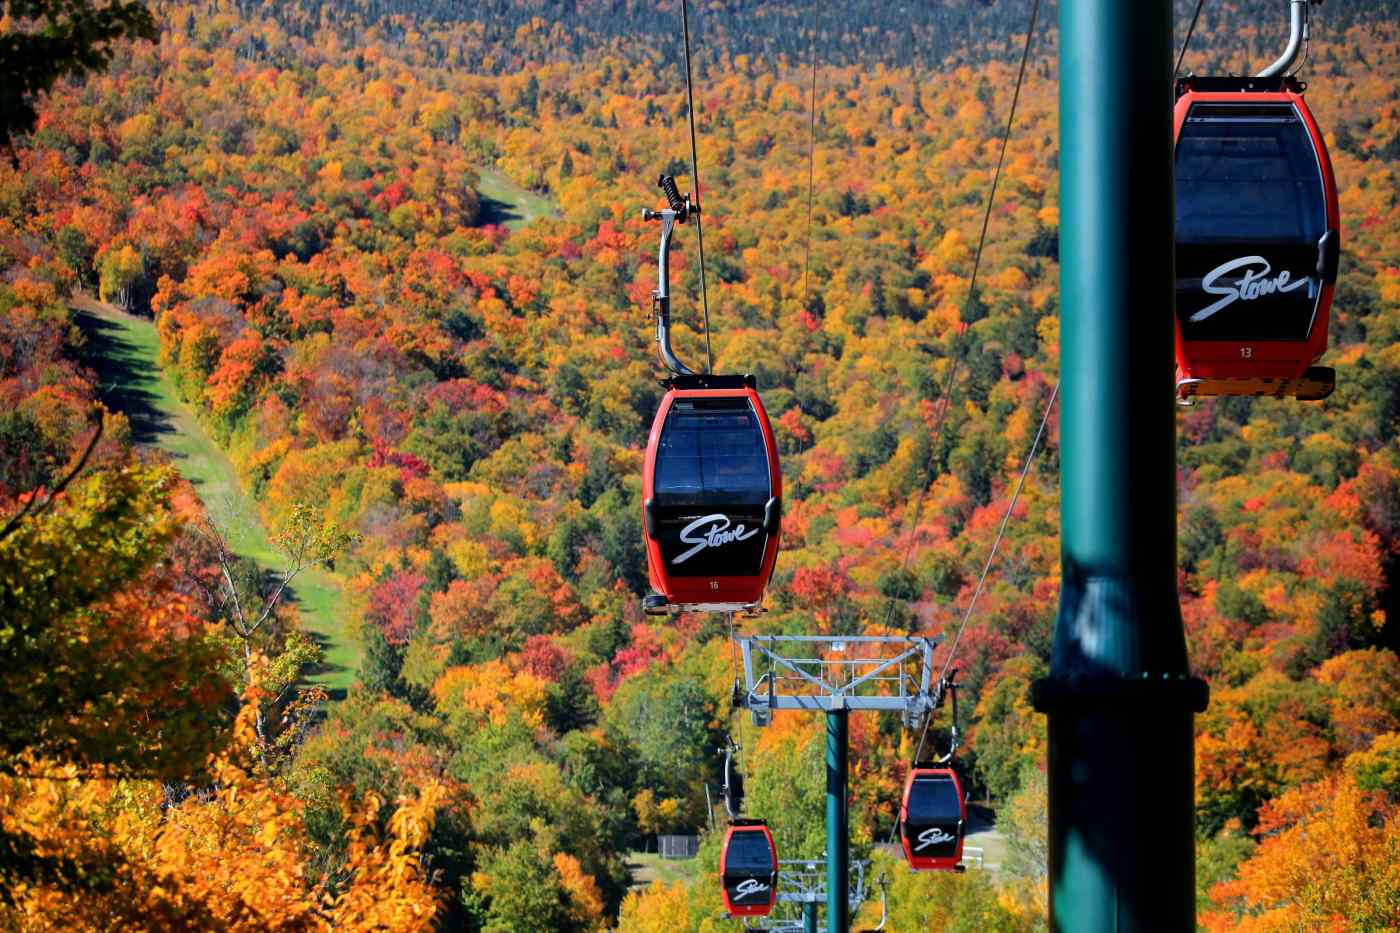 The Gondola SkyRide